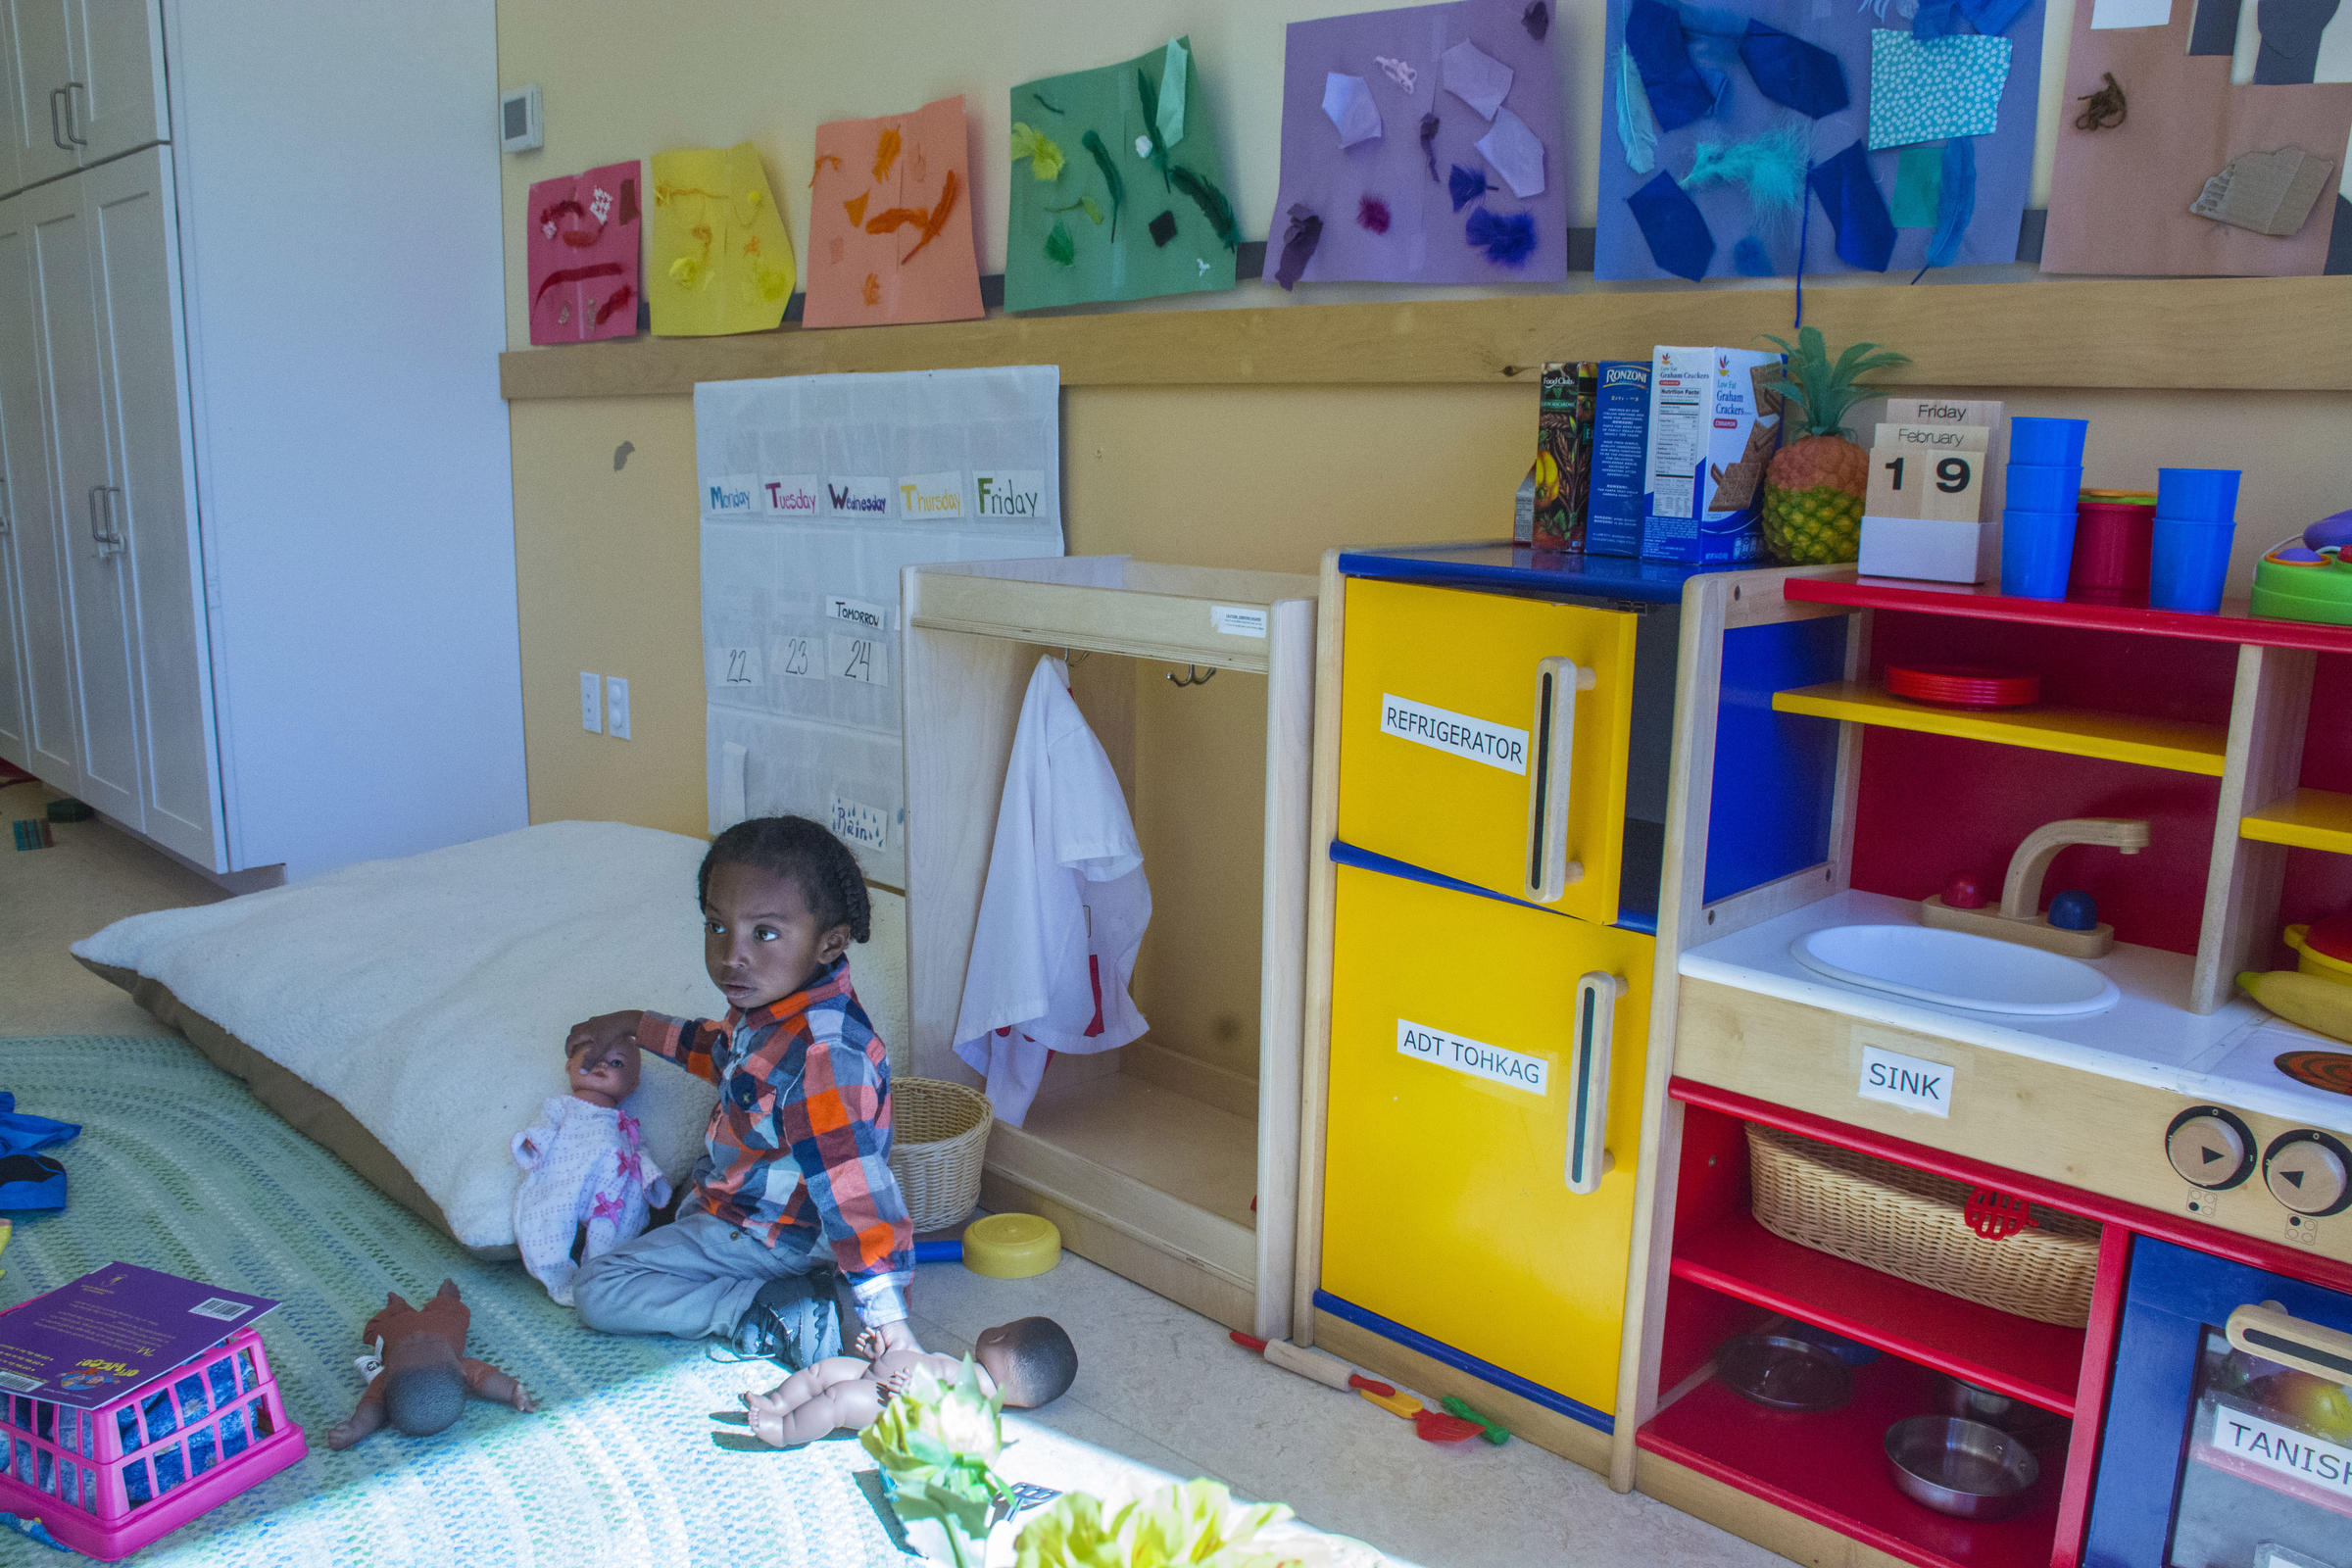 Preschool Kitchen Furniture Preschoolers May Be The Key To Reviving Shinnecock Language Wshu